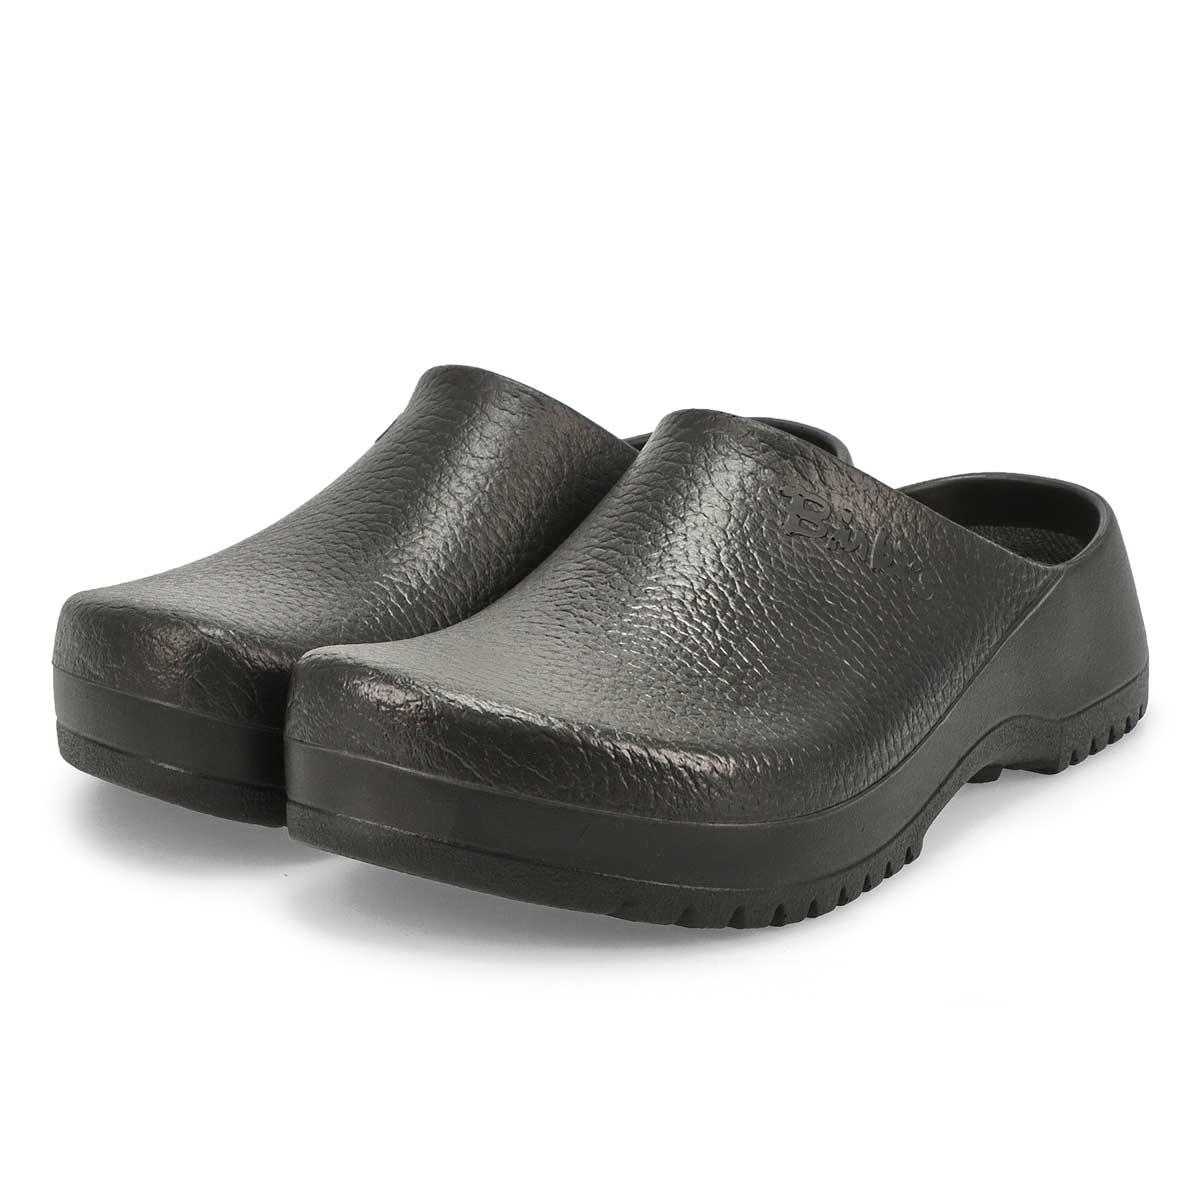 Sabots confortables SUPER-BIRKI, noir, femmes